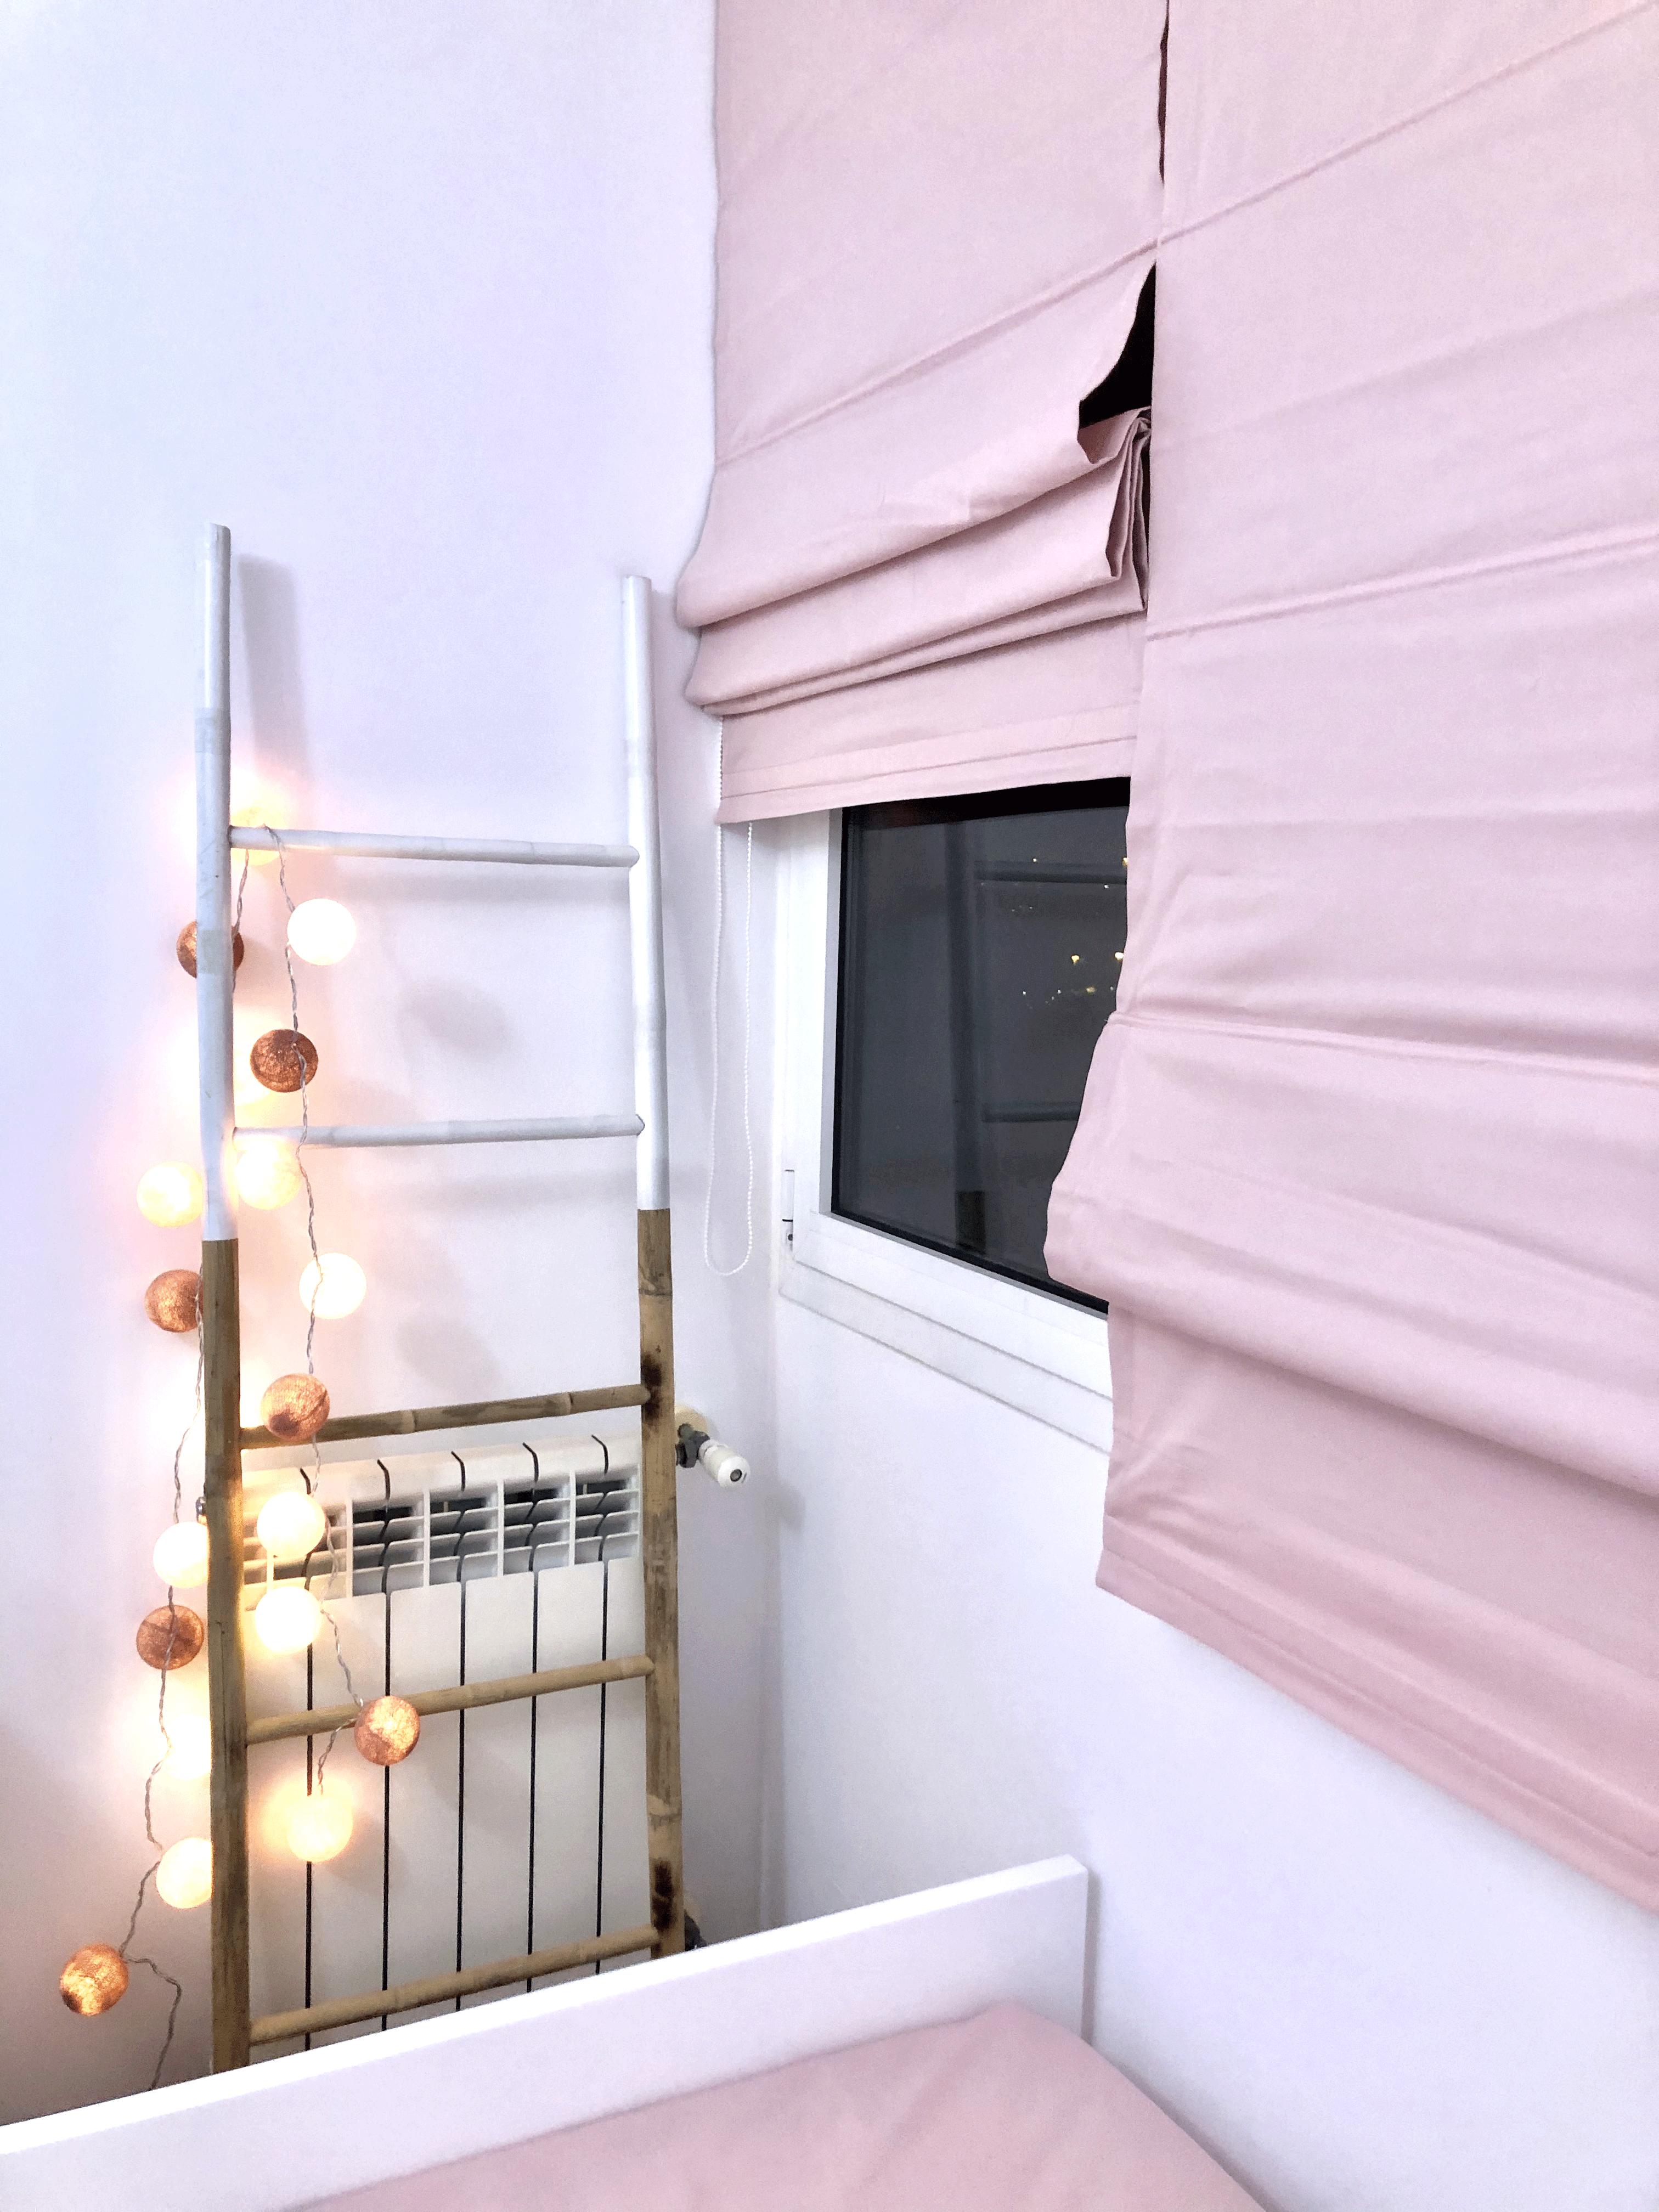 Grinalda cotton balls pink & gold